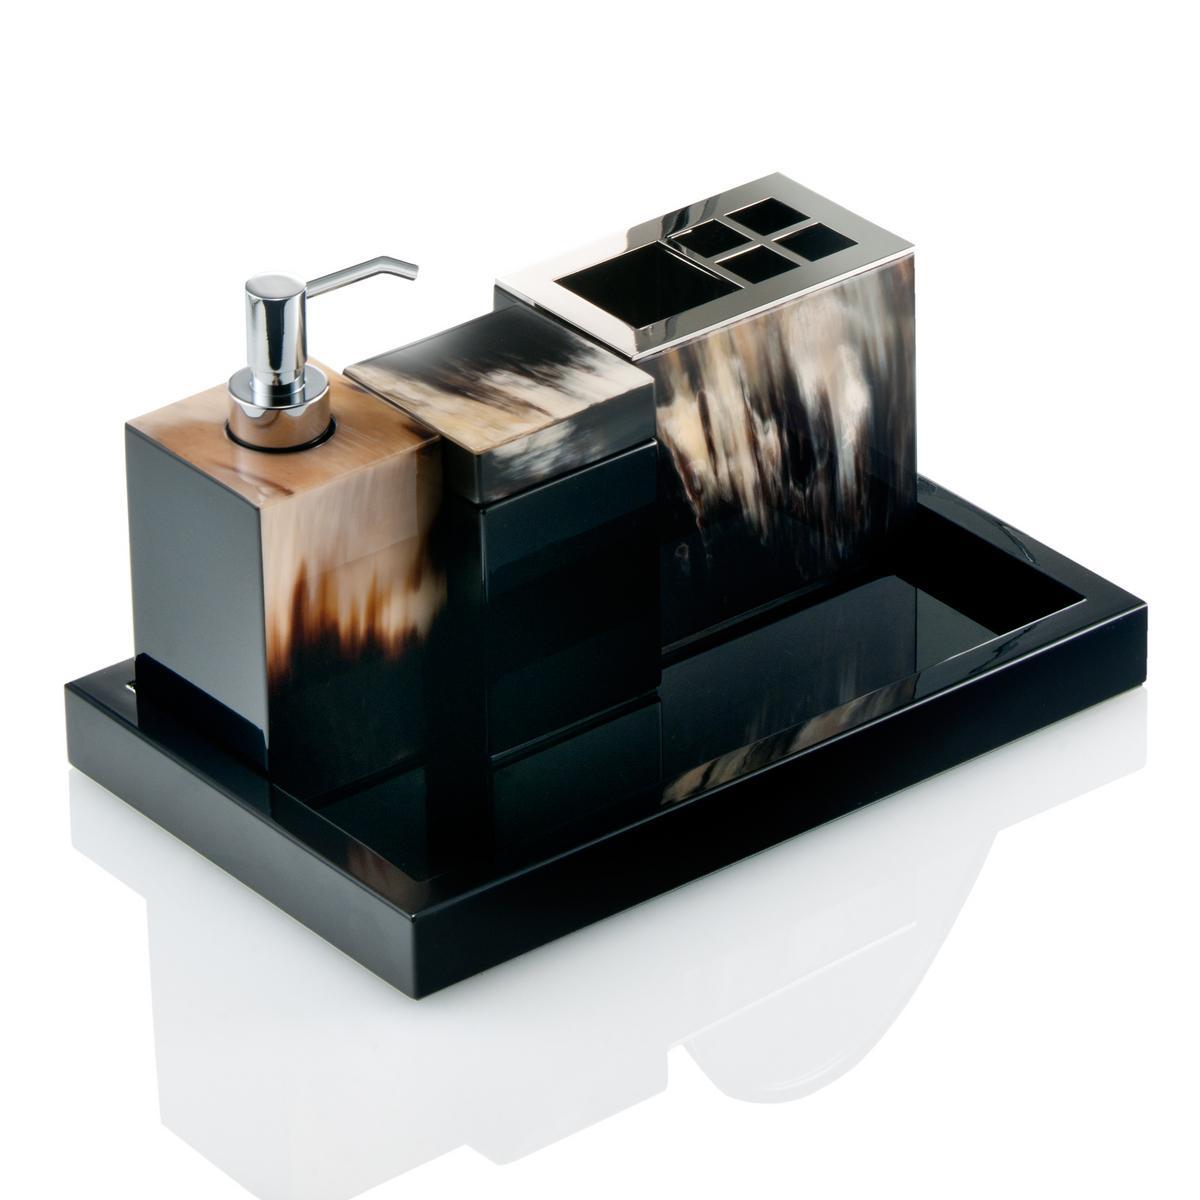 Bathroom Accessories Black arcahorn horn & lacquer bathroom accessories, black | artedona